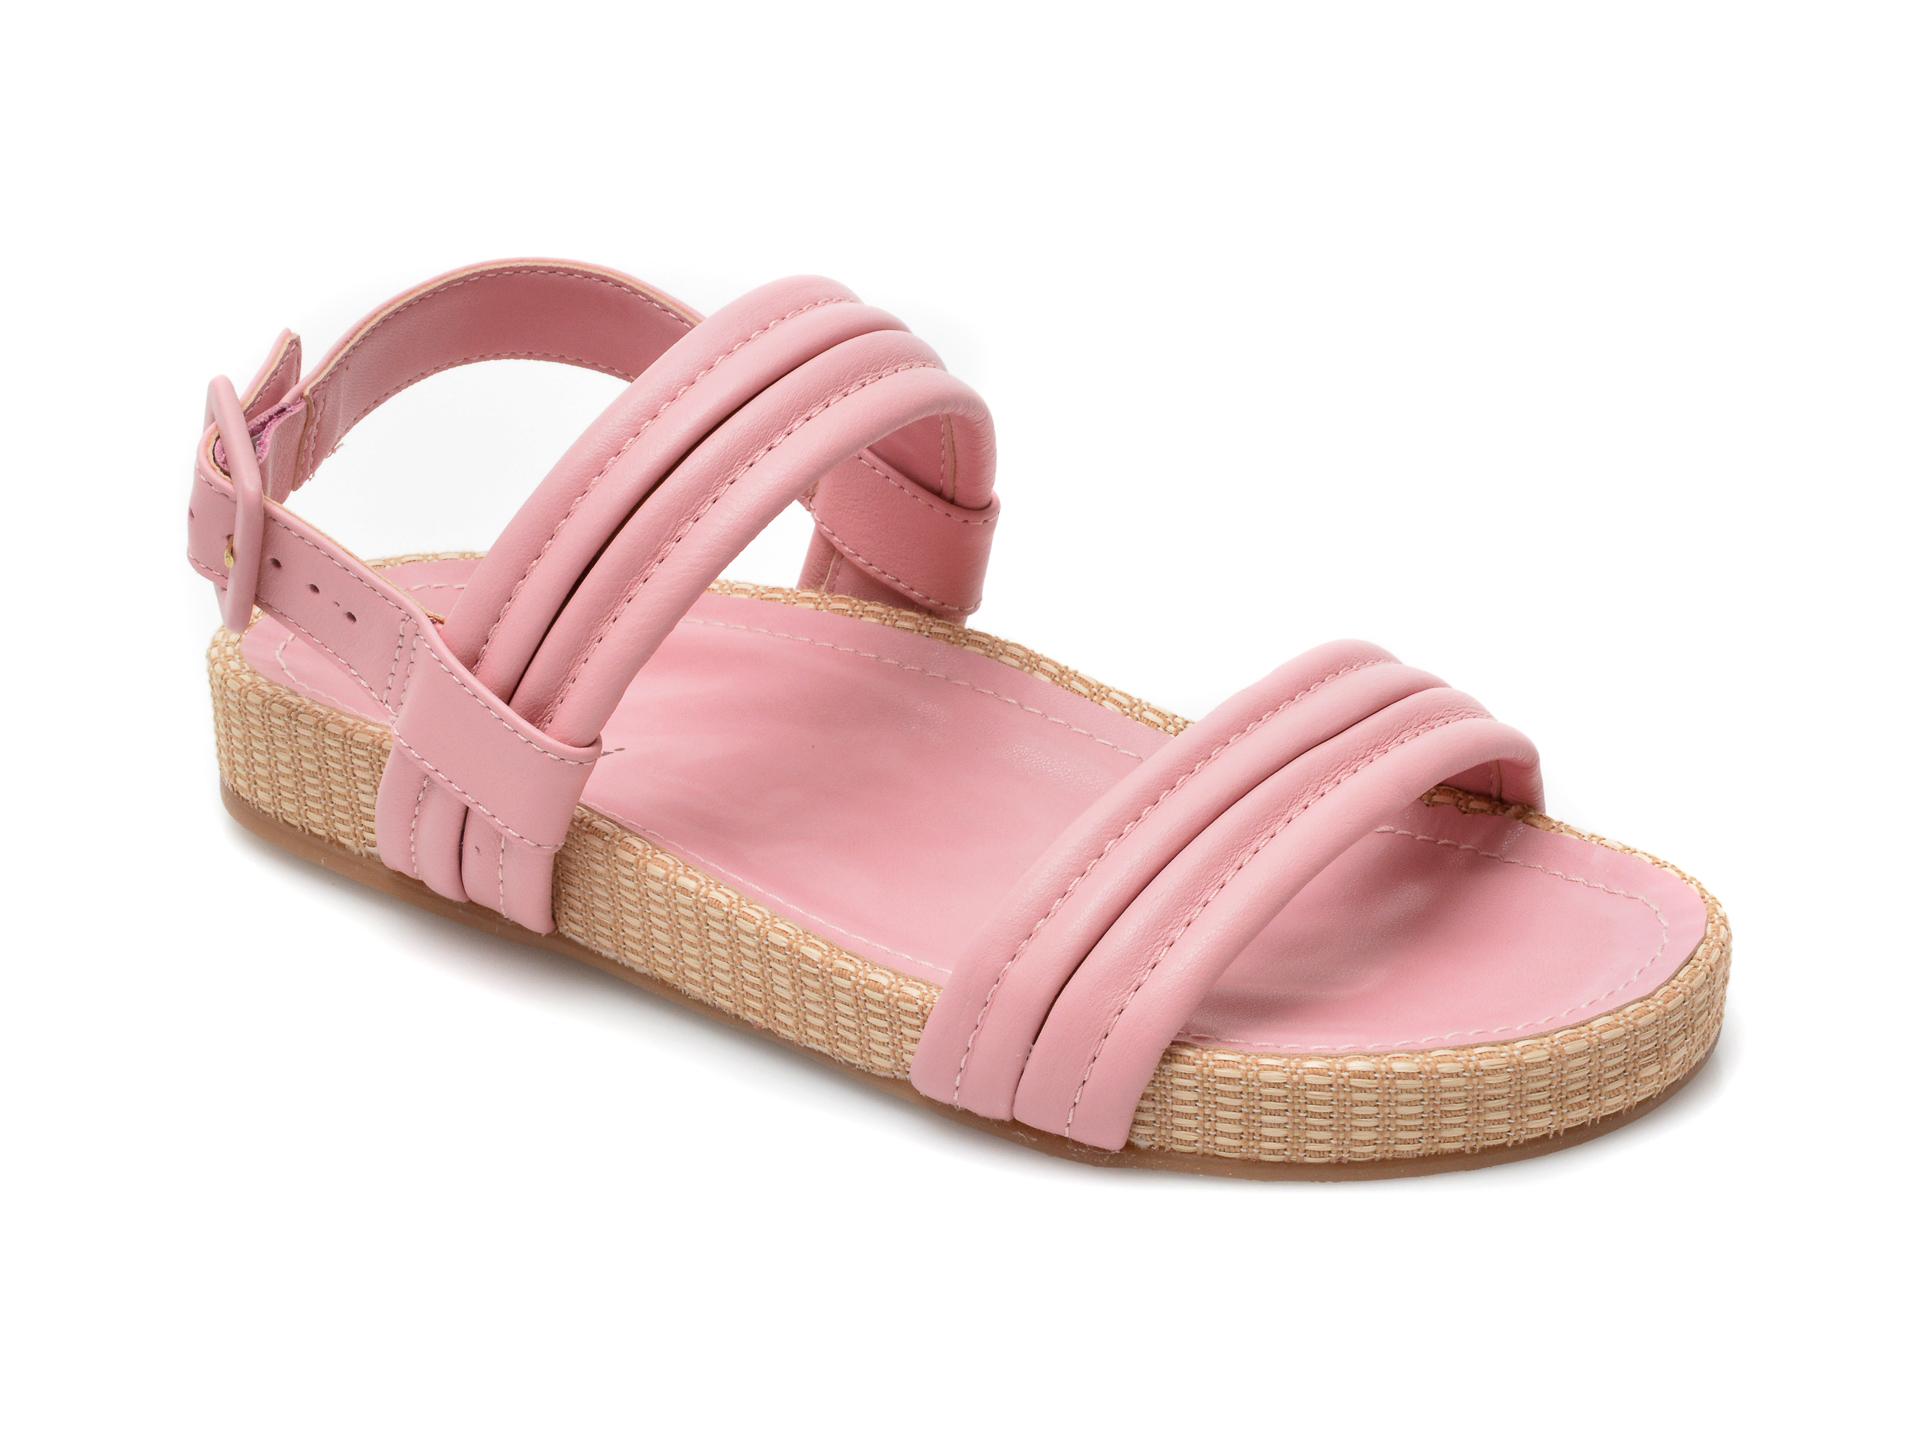 Sandale FLAVIA PASSINI roz, 6019701, din piele naturala imagine otter.ro 2021